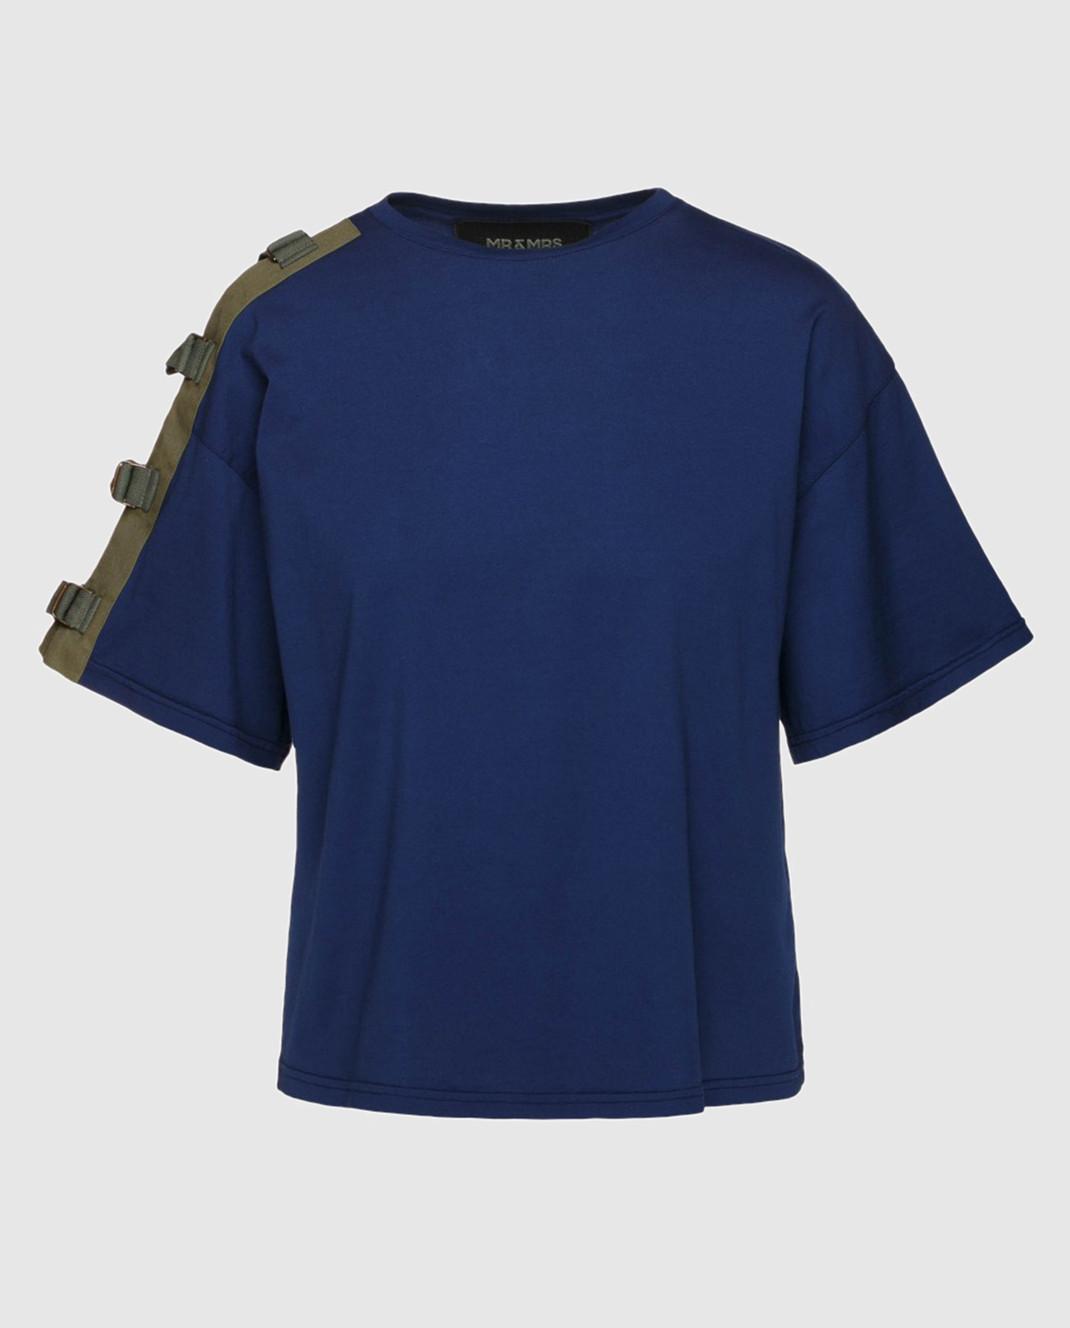 Mr&Mrs Italy Темно-синяя футболка с вышивкой на спине изображение 1